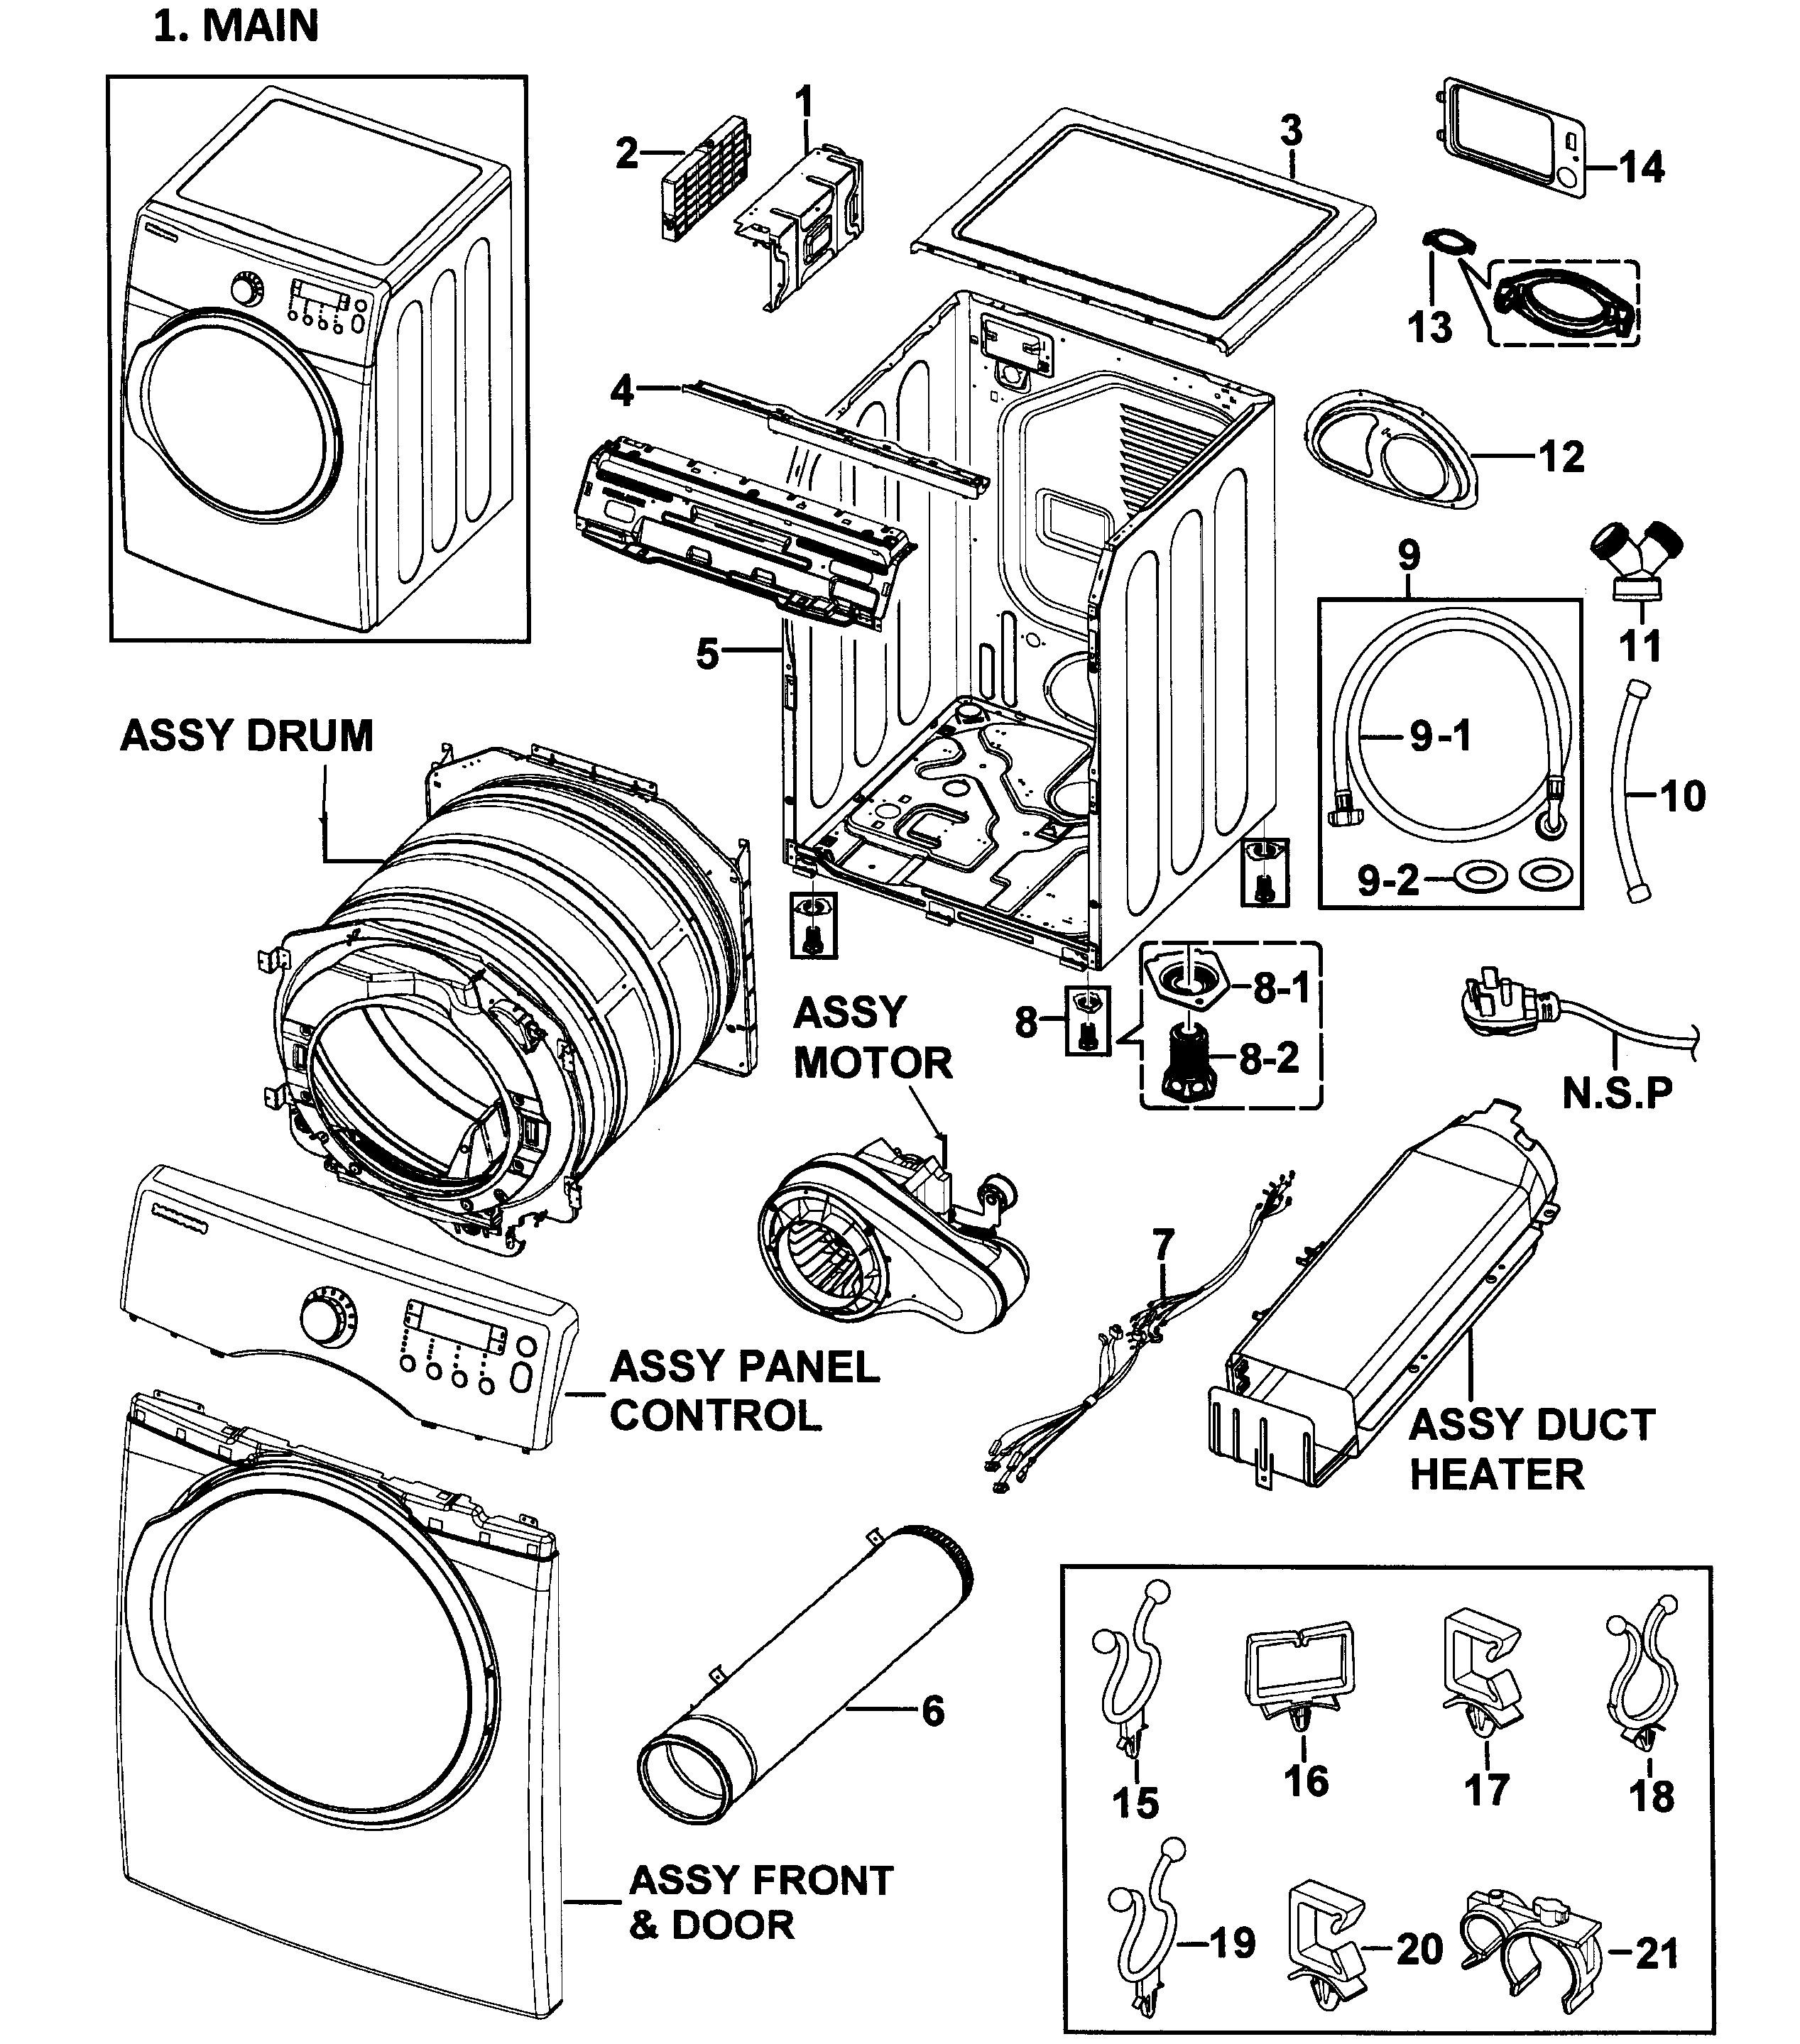 Ge Dryer Parts Diagram Samsung Model Dv350aer Xaa 0000 Residential Dryer Genuine Parts Of Ge Dryer Parts Diagram